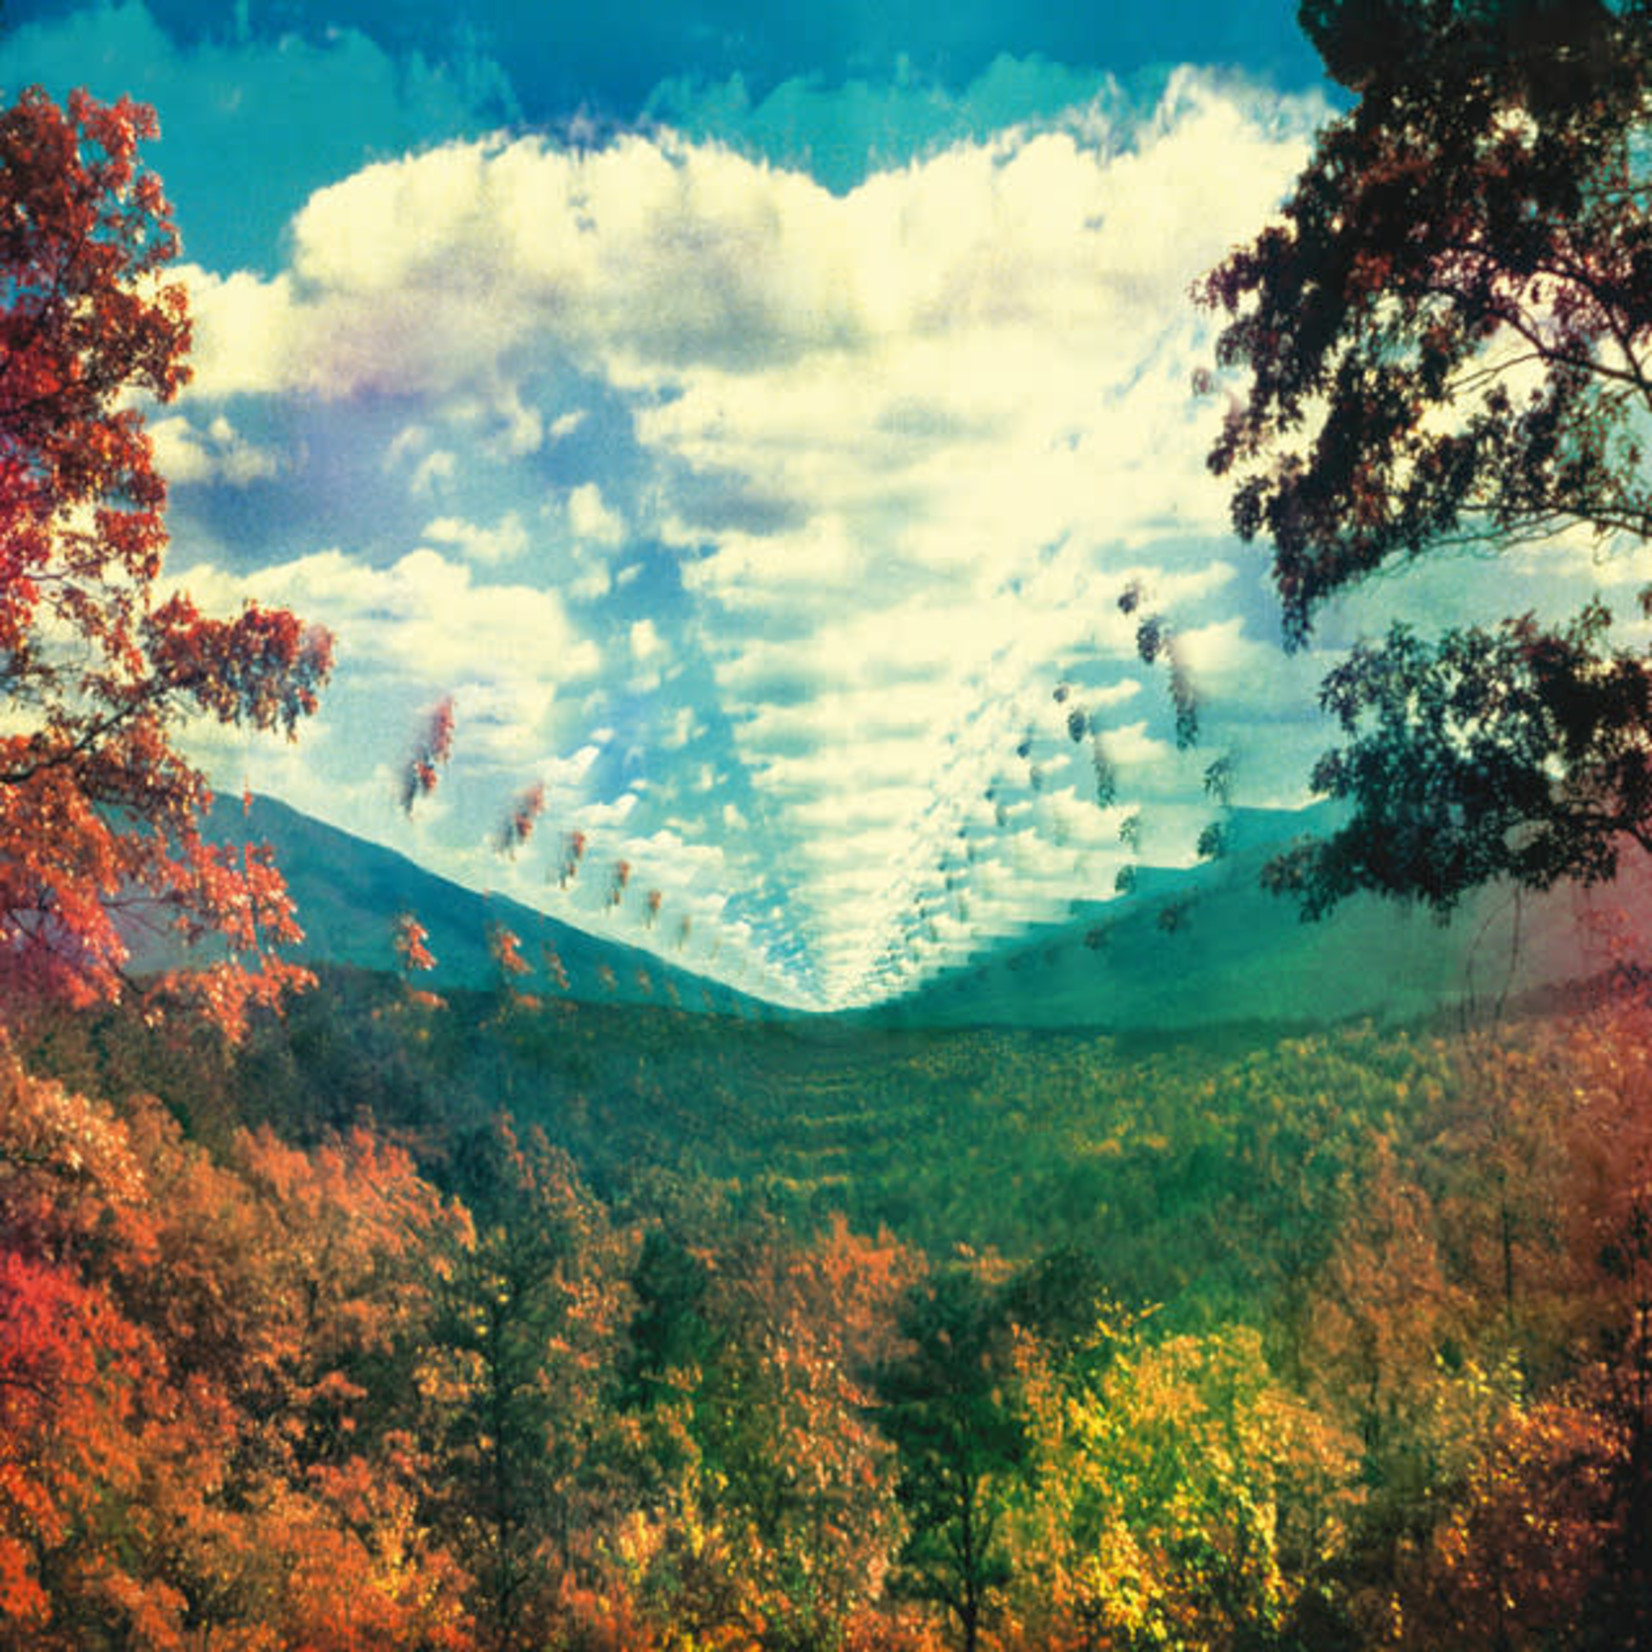 Vinyl Tame Impala - Innerspeaker